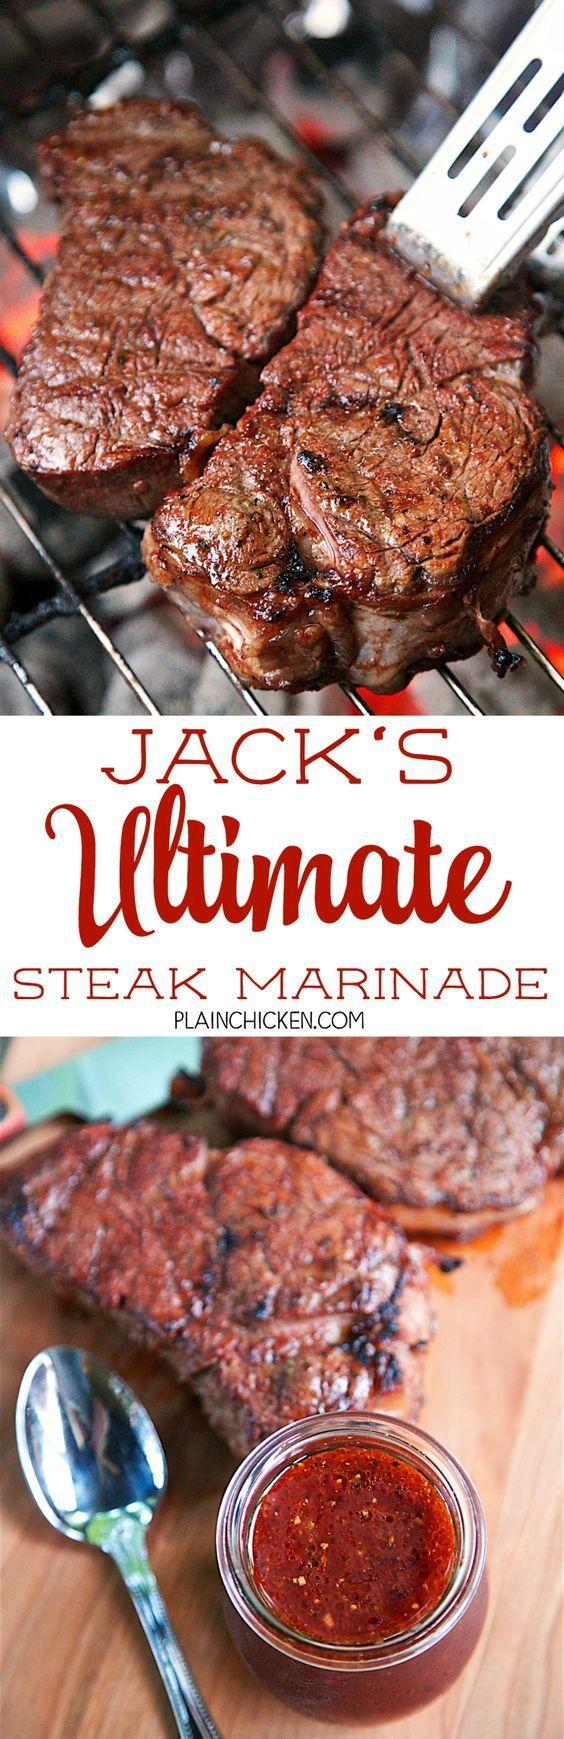 Jack S Ultimate Steak Marinade Diy Food Recipes Recipes Marinated Steak